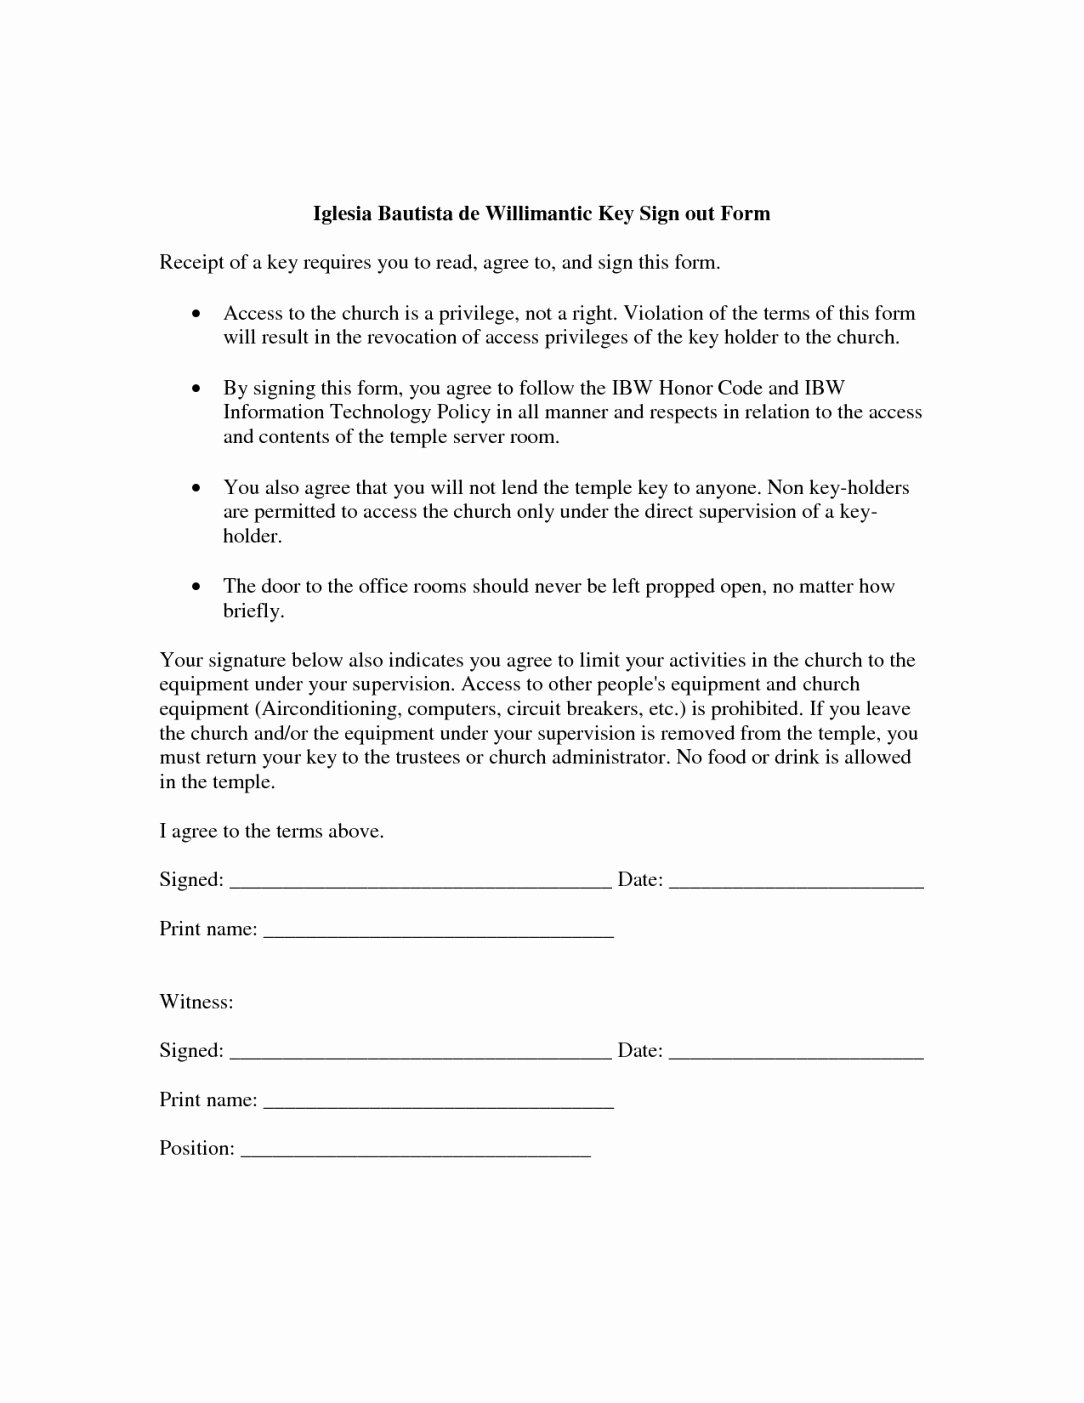 Employee Key Holder Agreement Beautiful Key form Template Dee84d7b0c50 Proshredelite